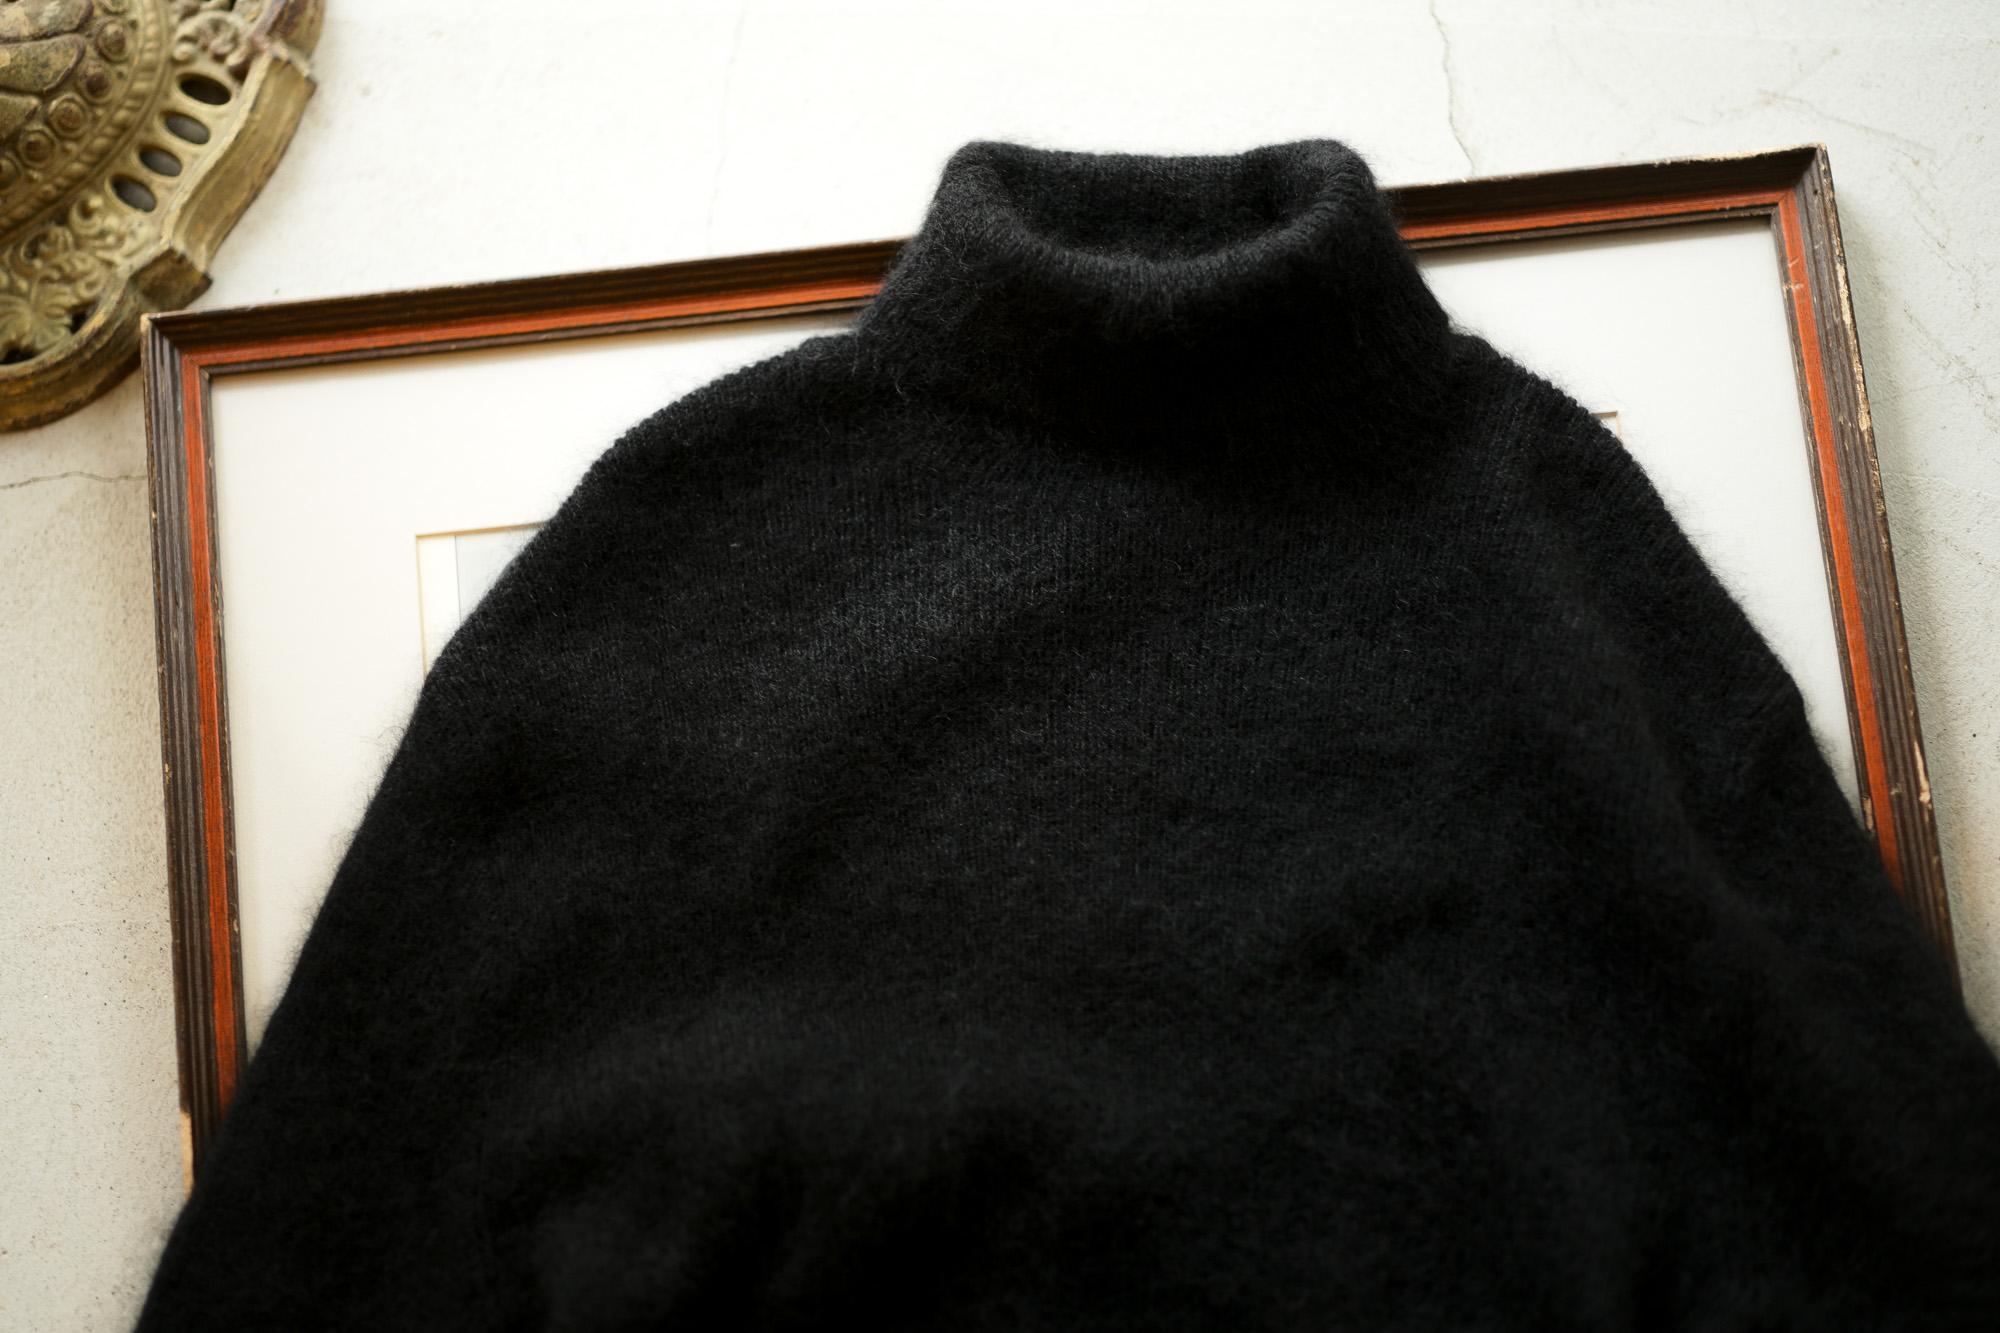 RIVORA GENTLE Knit Crew Neck Cashmere Mohair Silk BLACK・010 【Alto e Diritto 別注】【Special Model】愛知 名古屋 altoediritto アルトエデリット RIVORA (リヴォラ) GENTLE Knit Crew Neck (ジェントル ニット クルーネック) Cashmere Mohair Silk カシミア モヘア シルク ニット クルーネックセーター BLACK (ブラック・010) MADE IN JAPAN (日本製)